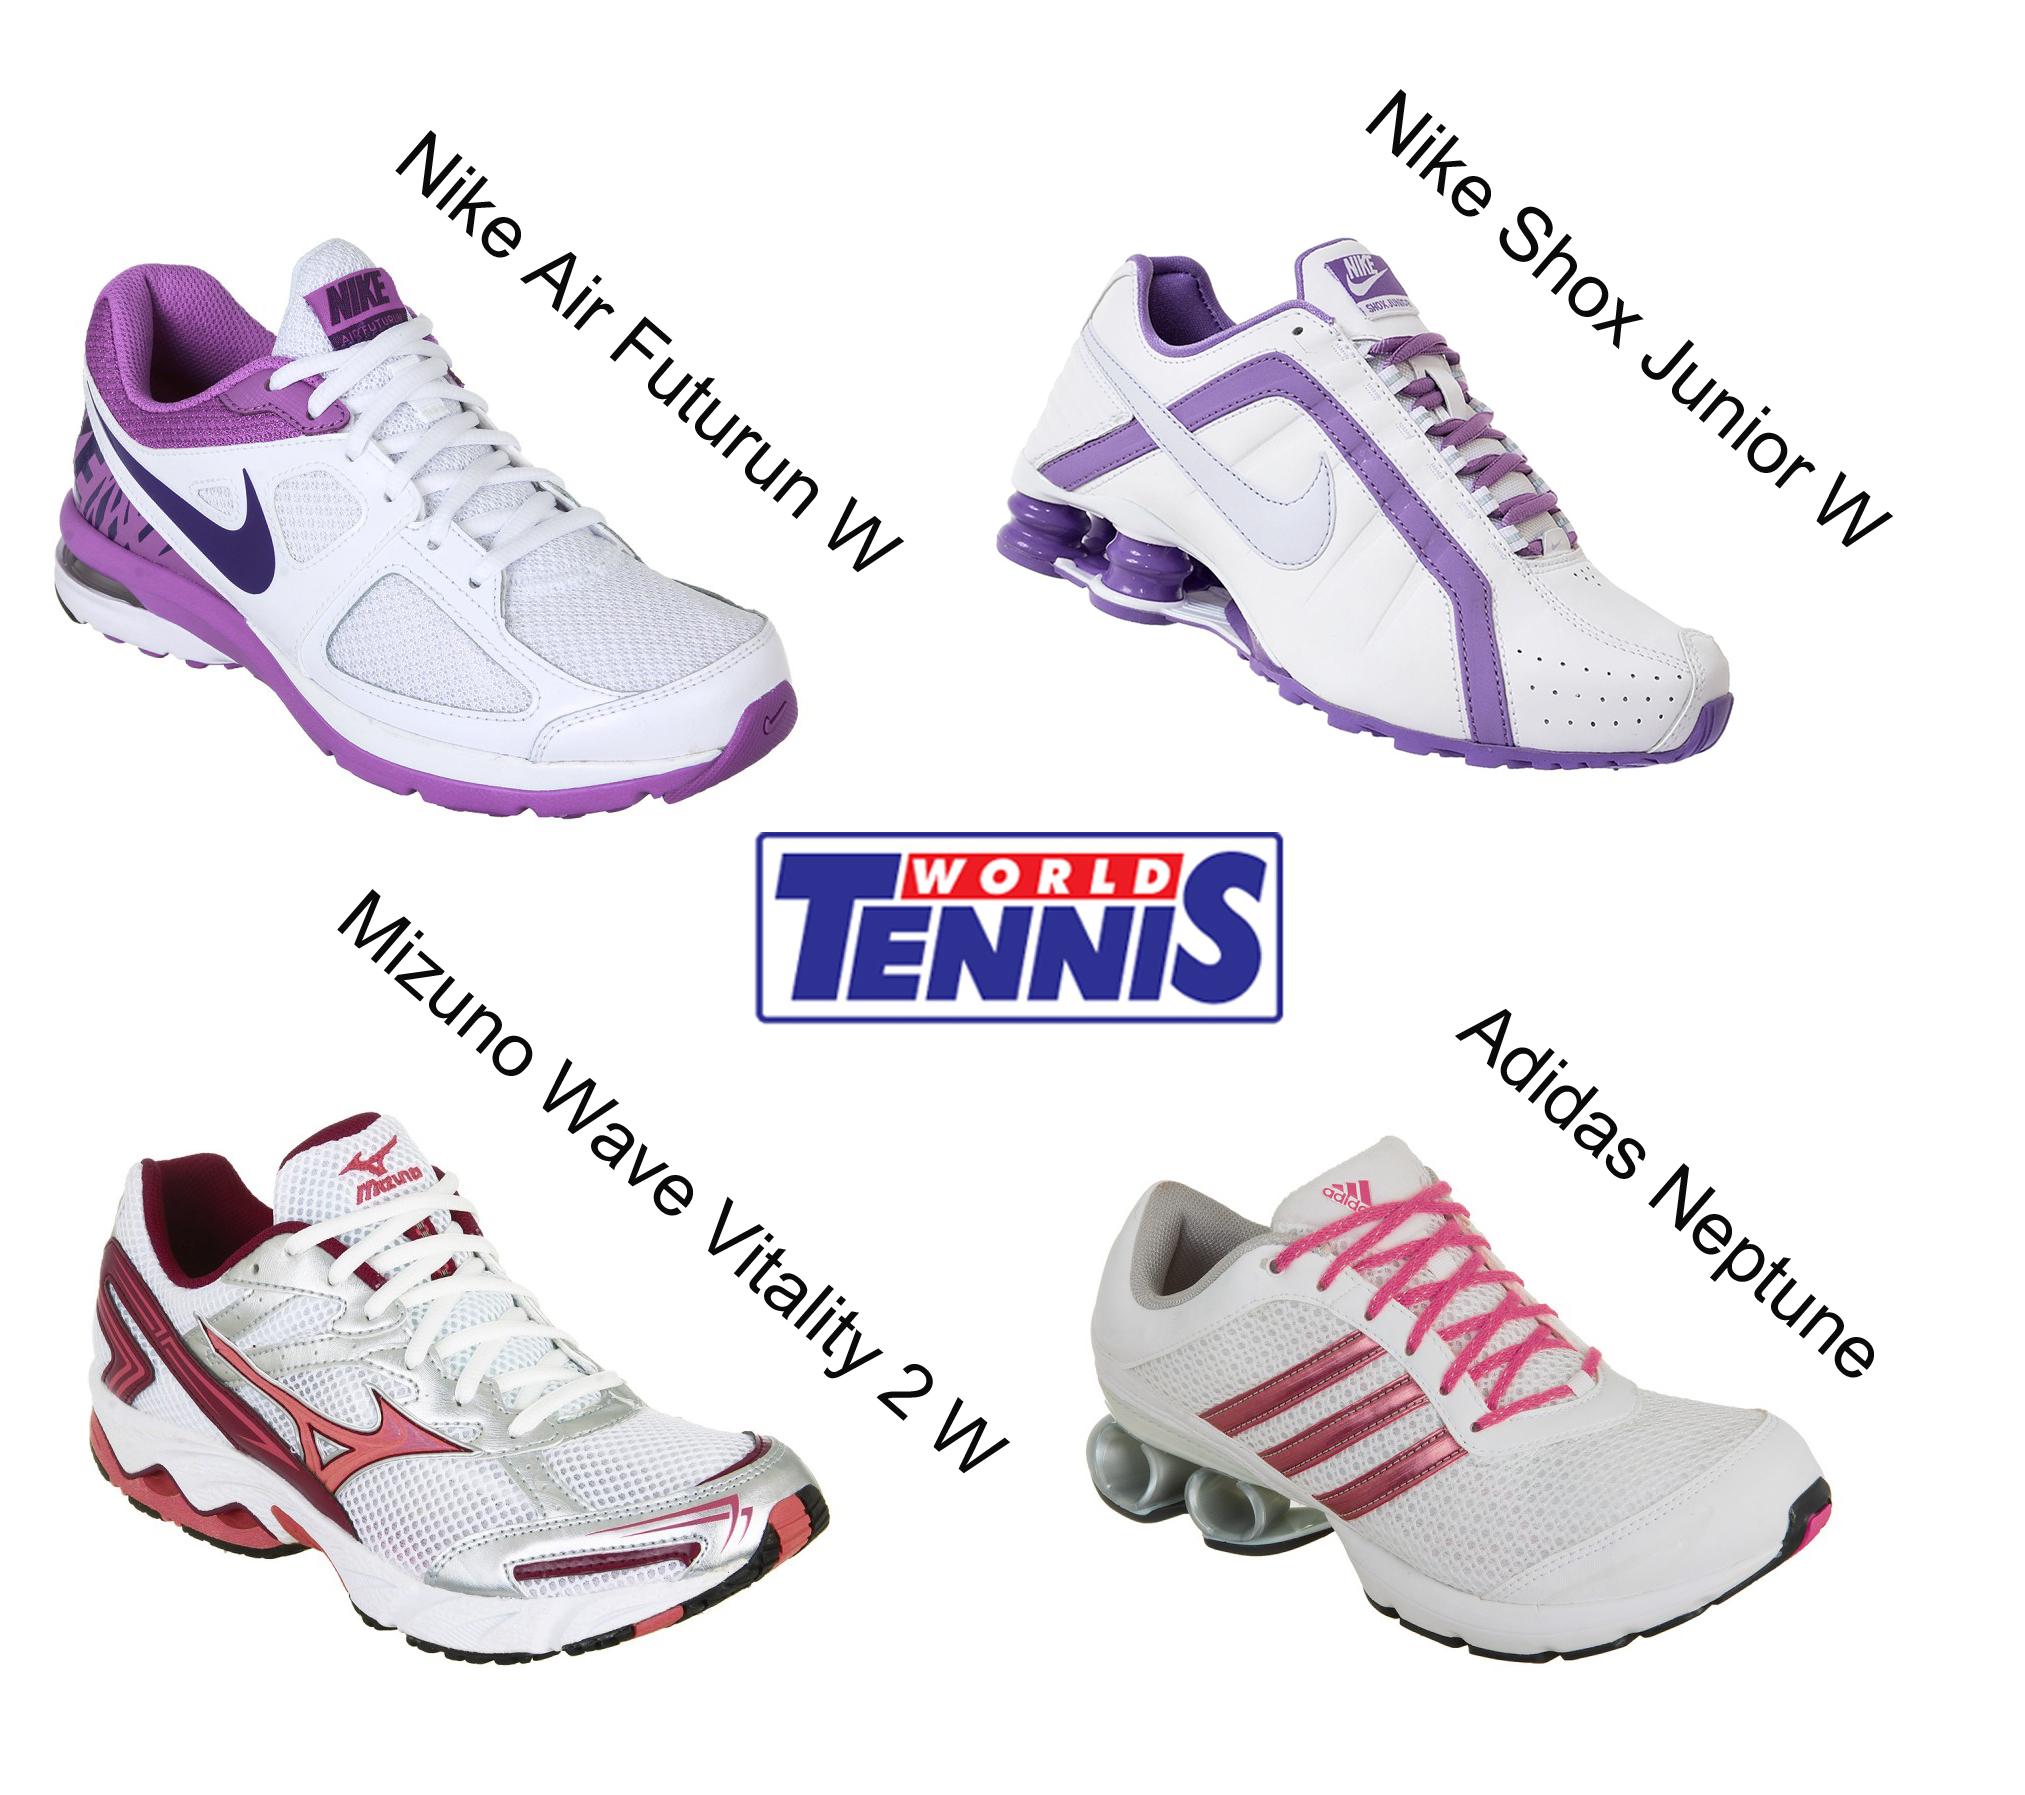 d06dc5690a Deu branco no tênis feminino - World Tennis - Tênis